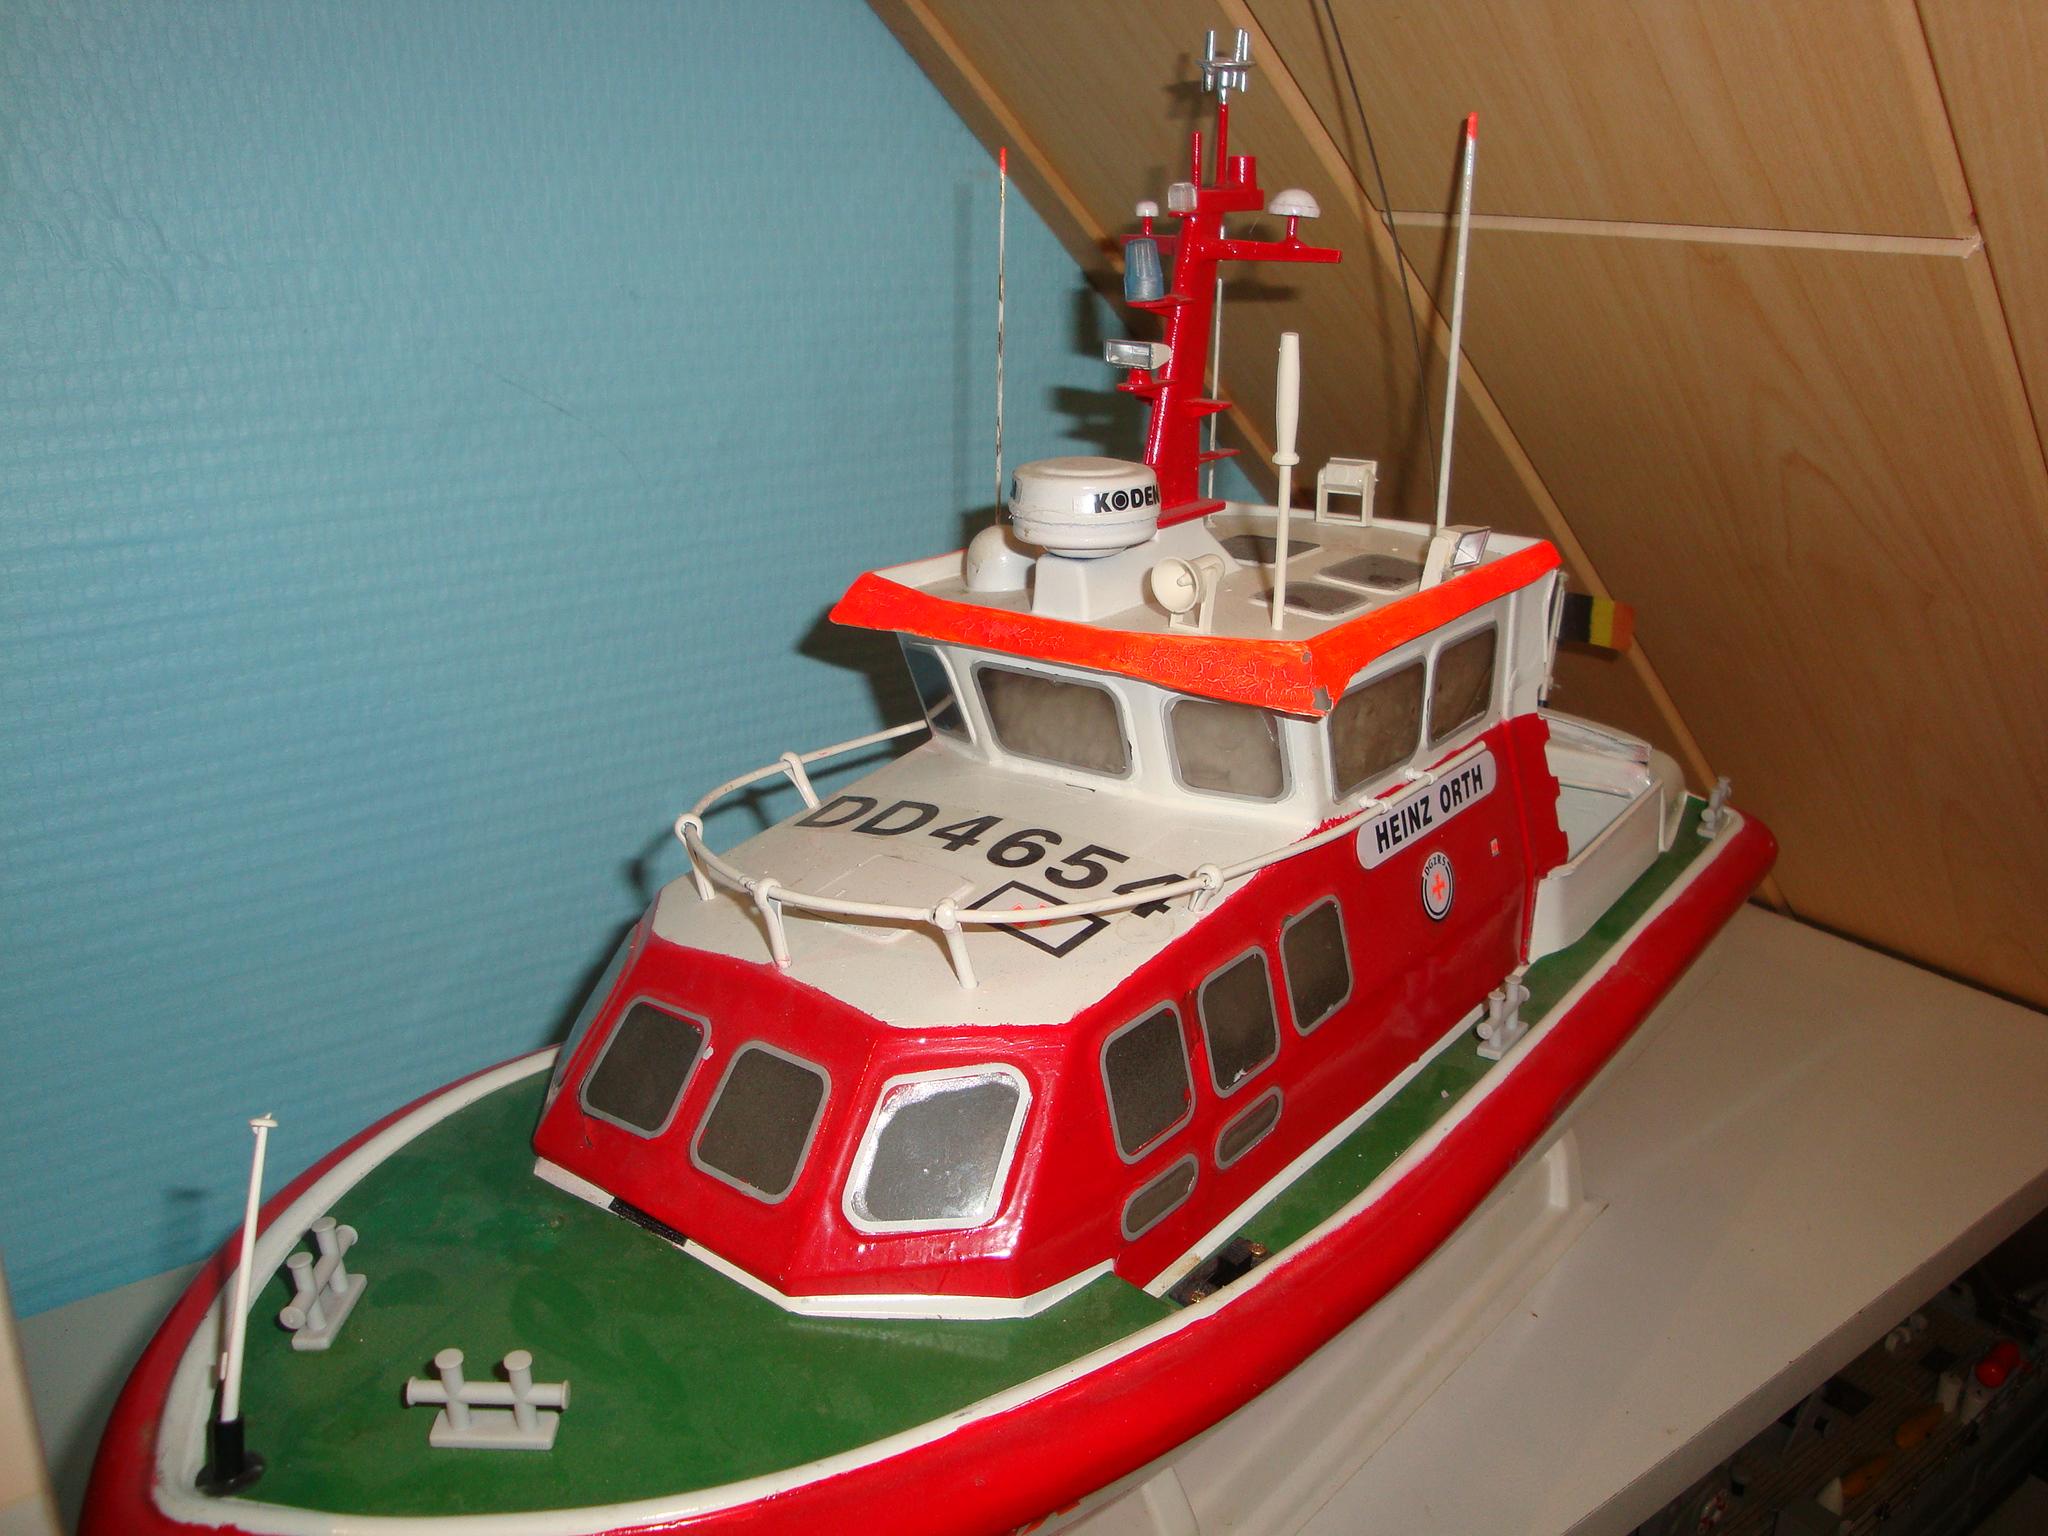 La flotte de NAVYCOOL - Page 2 100117043643895285263707